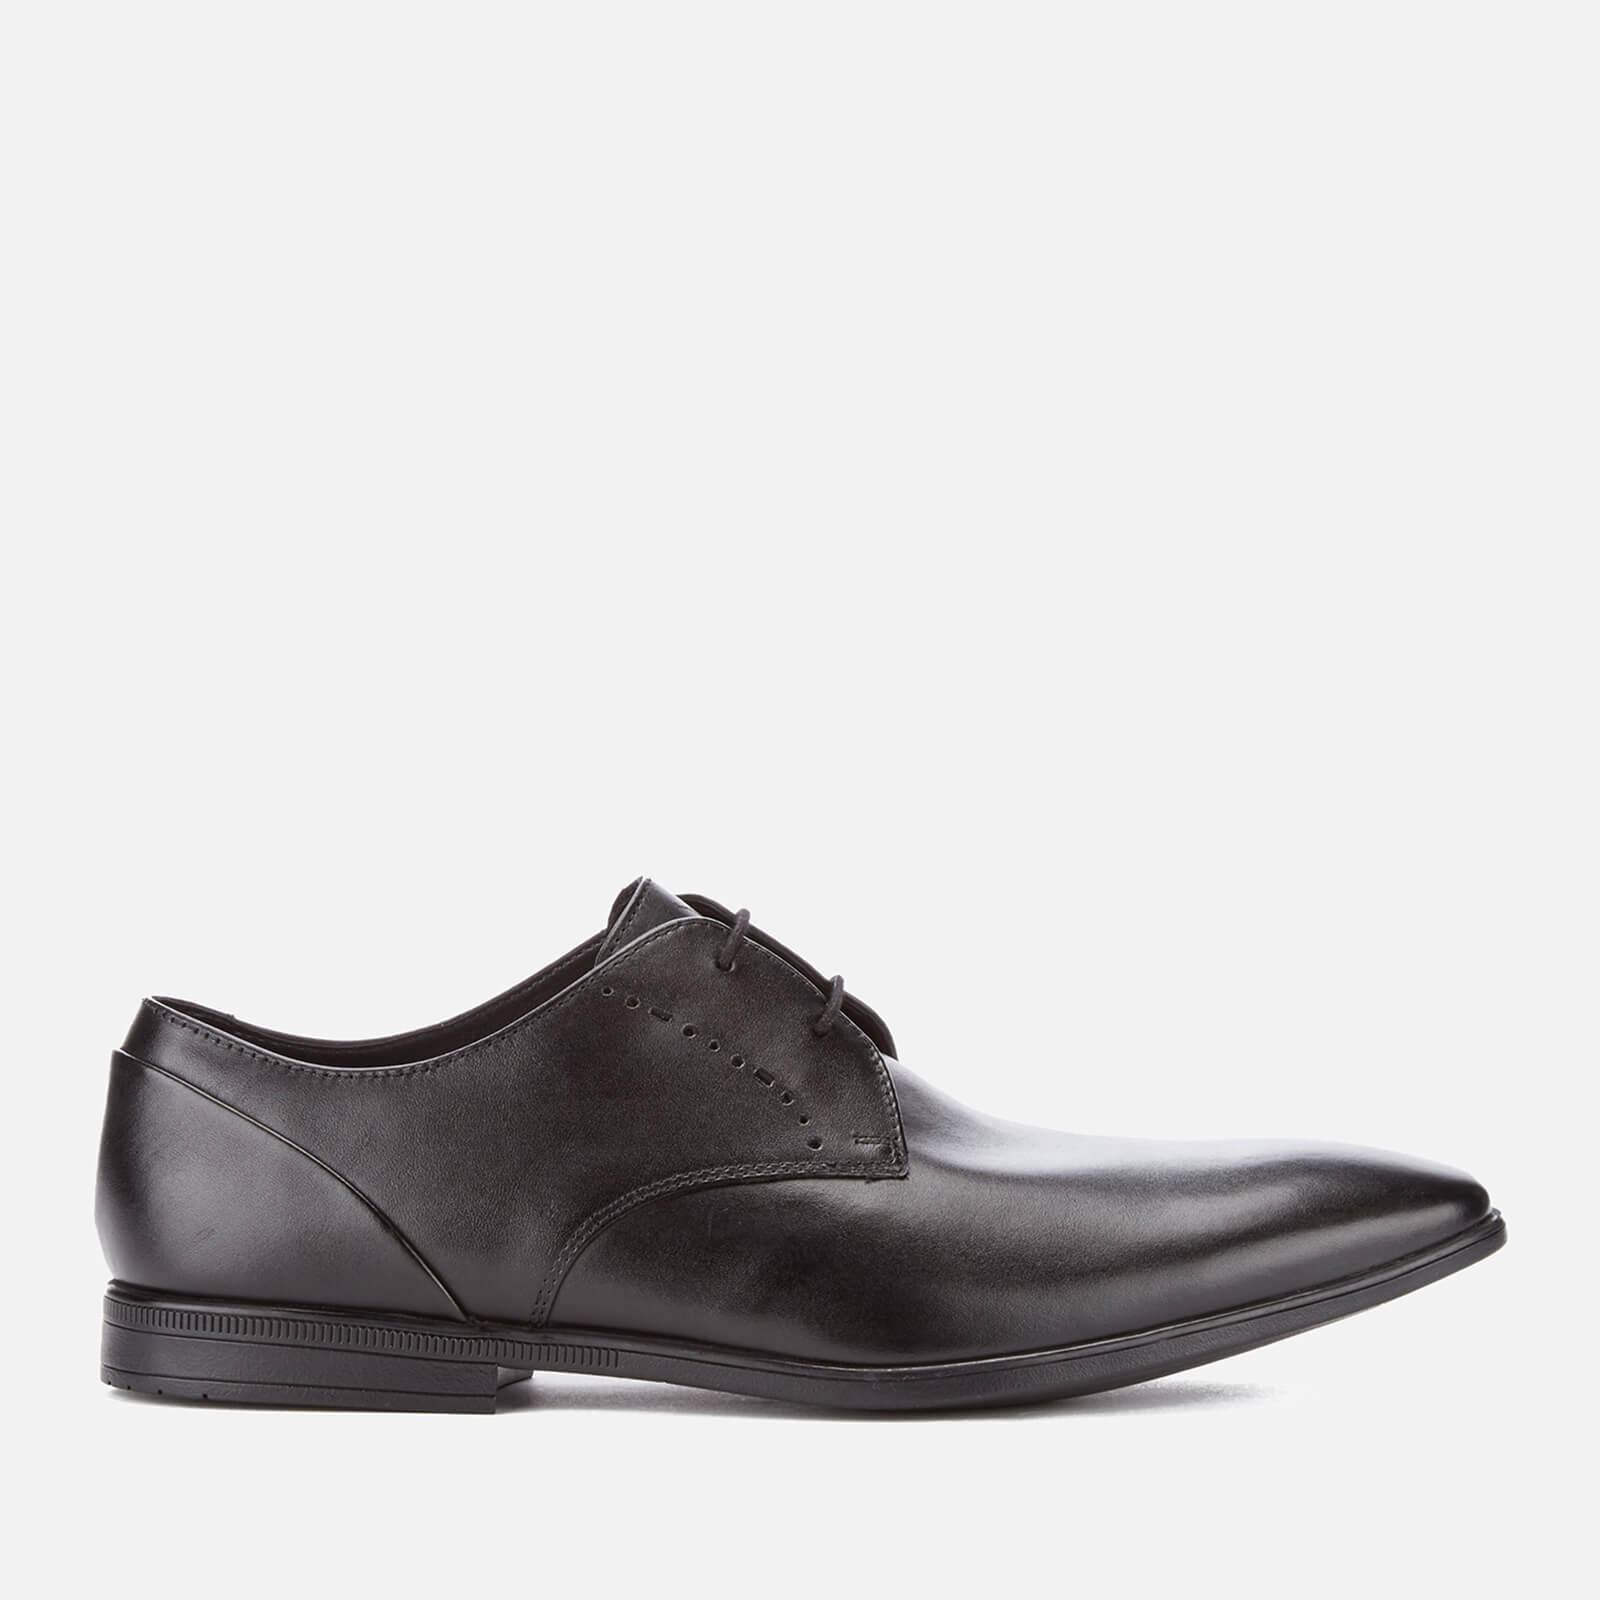 Clarks Men's Bampton Lace Leather Derby Shoes - Black - UK 8